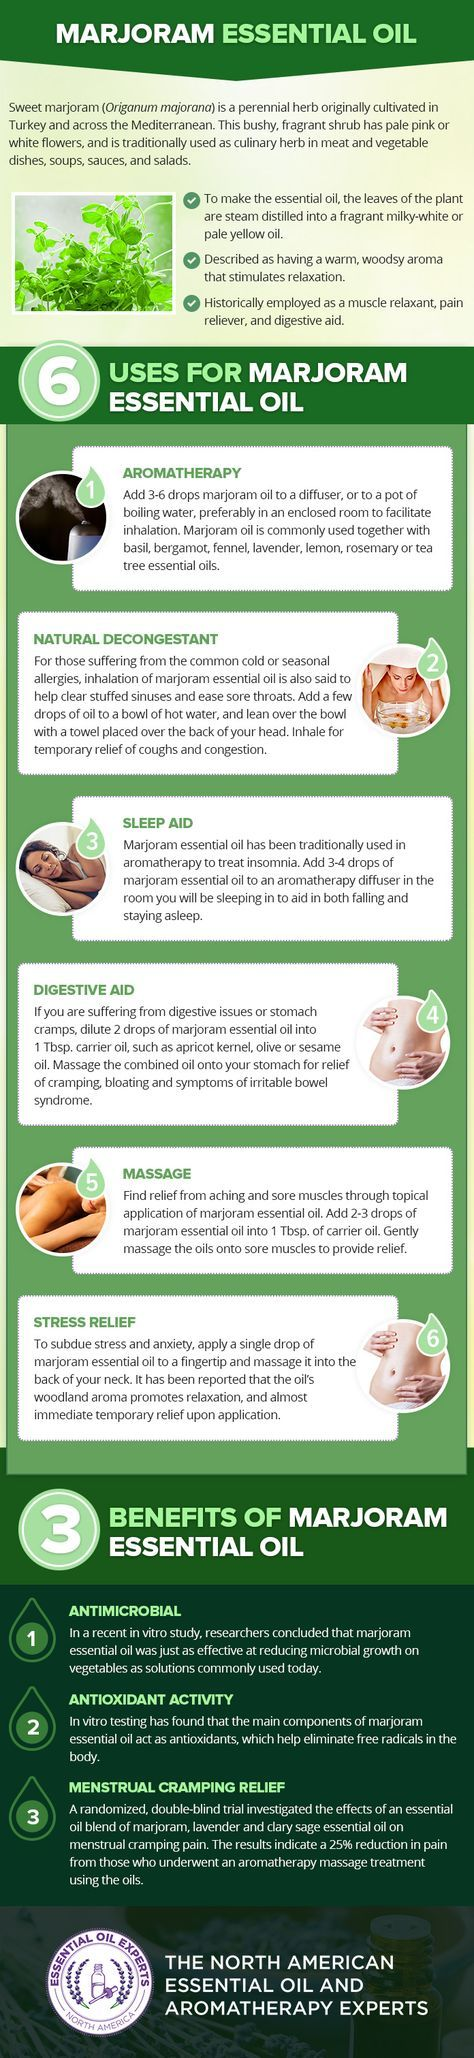 Marjoram Essential Oil Uses & Benefits